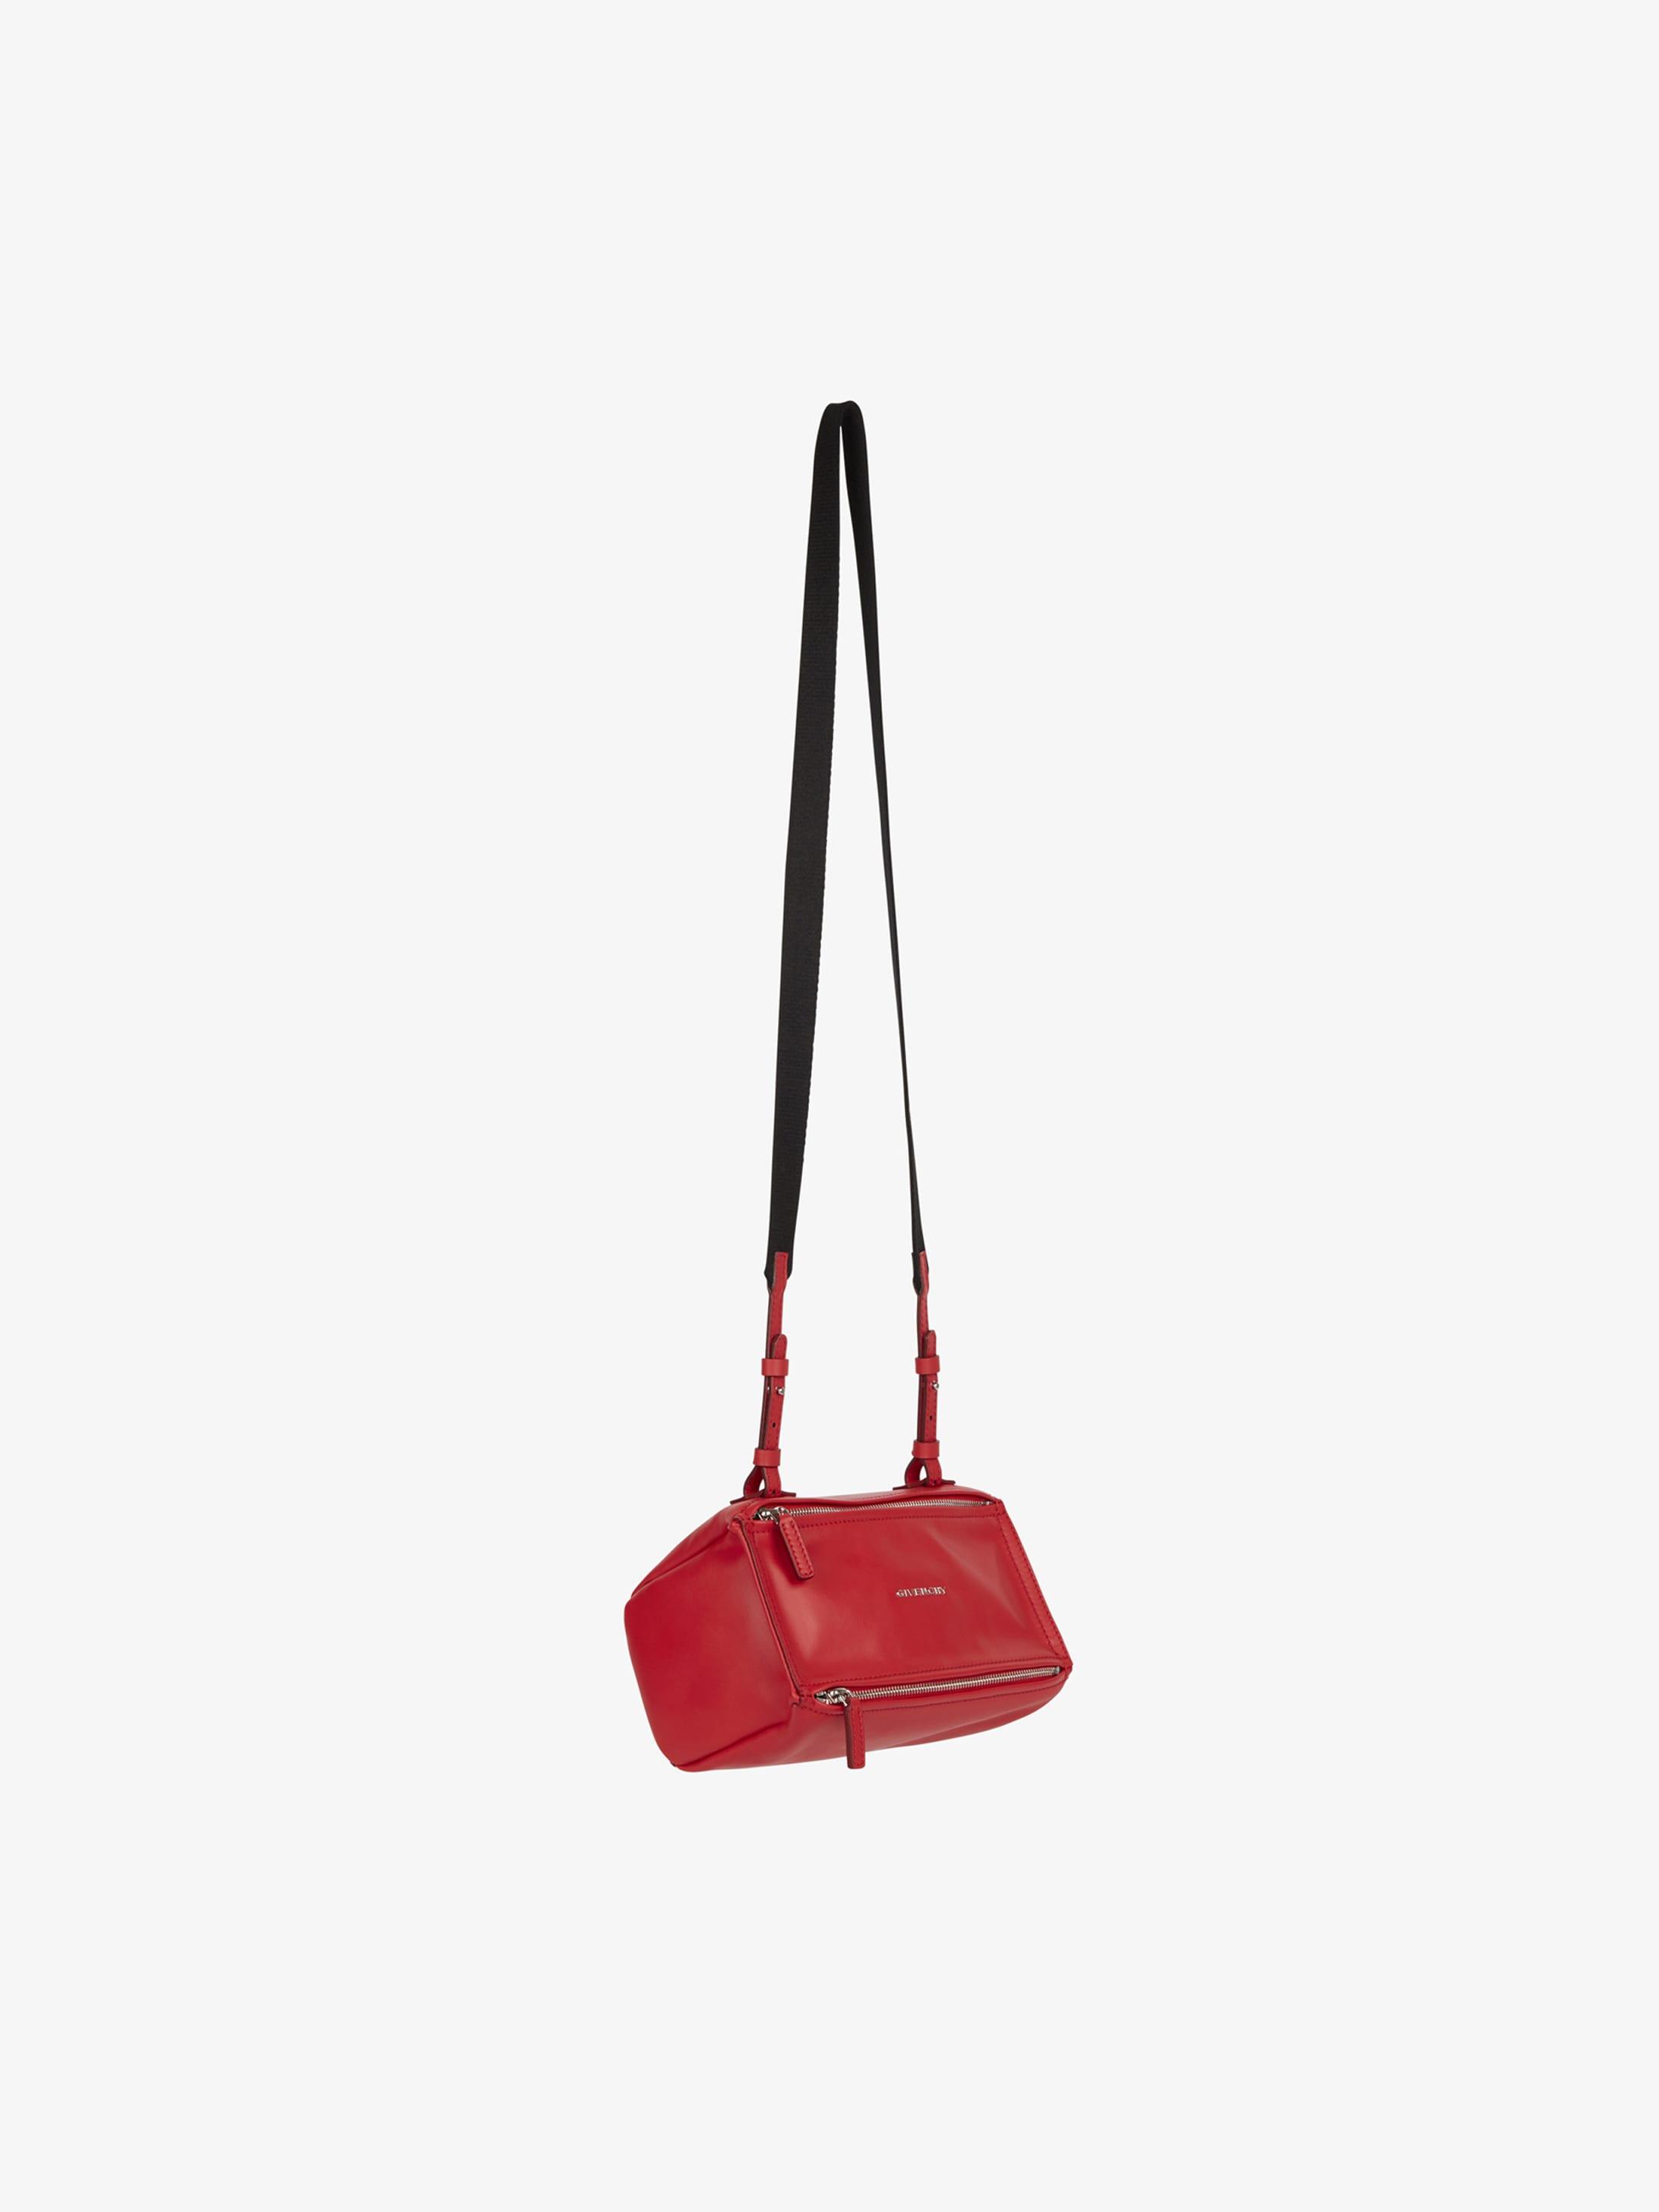 Mini Pandora bag with GIVENCHY PARIS strap